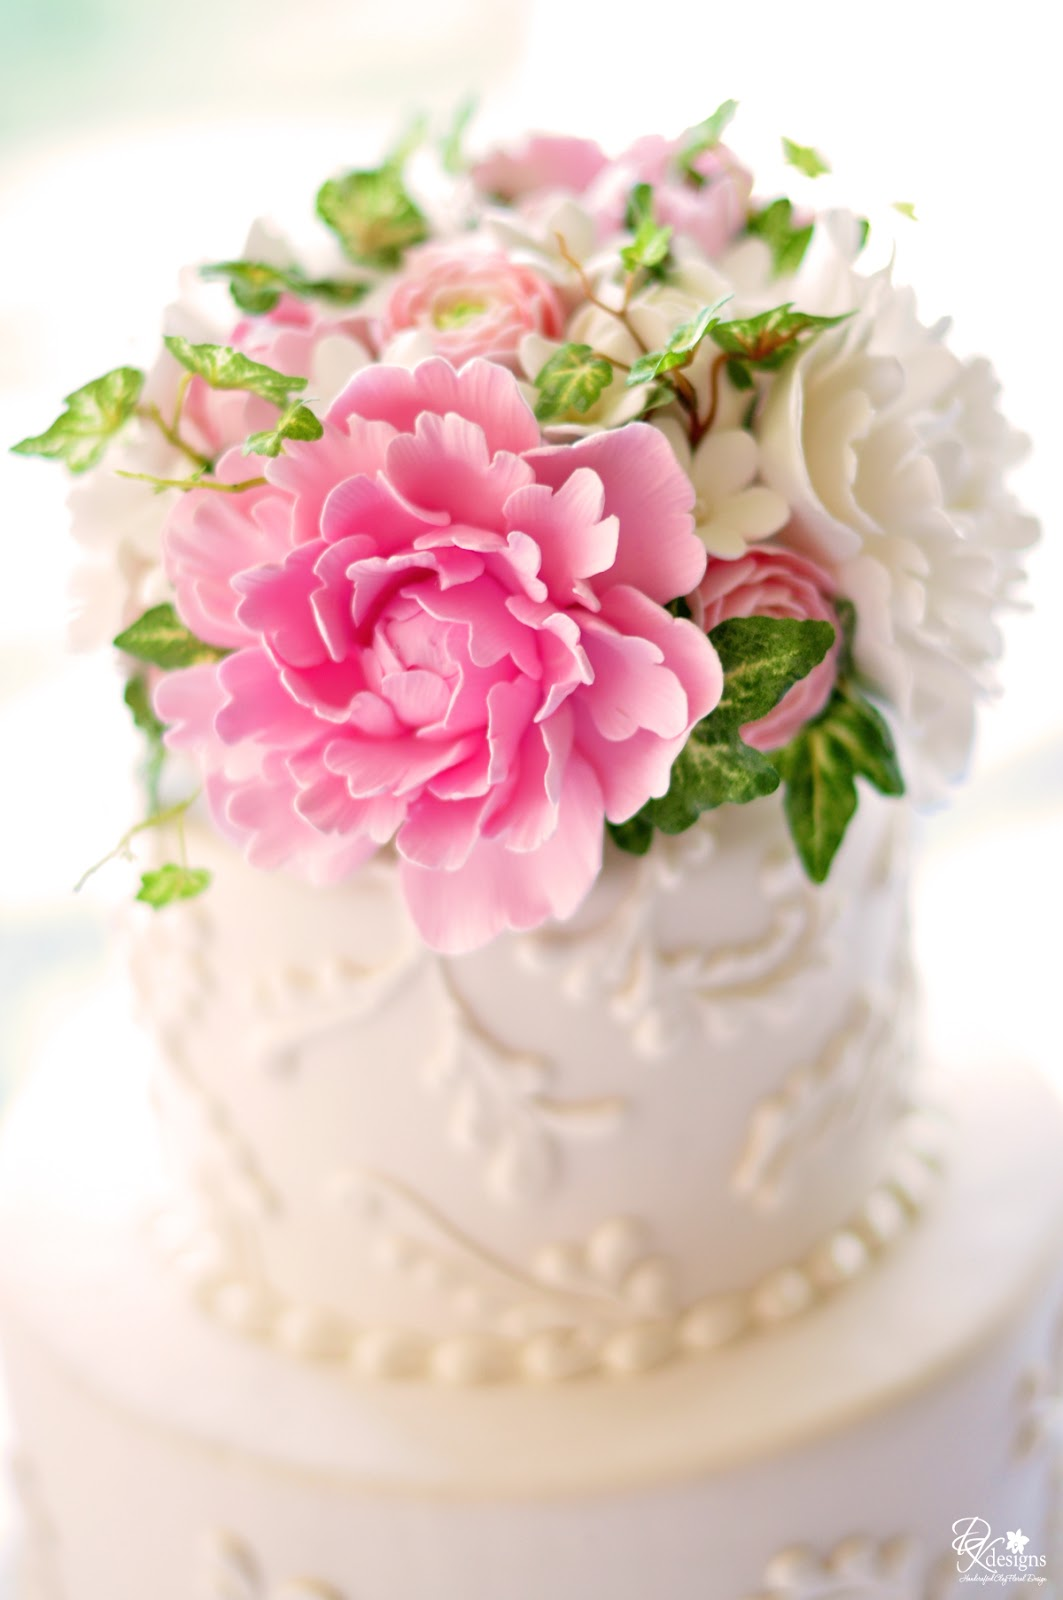 Last Minute Cake Topper.... - DK Designs